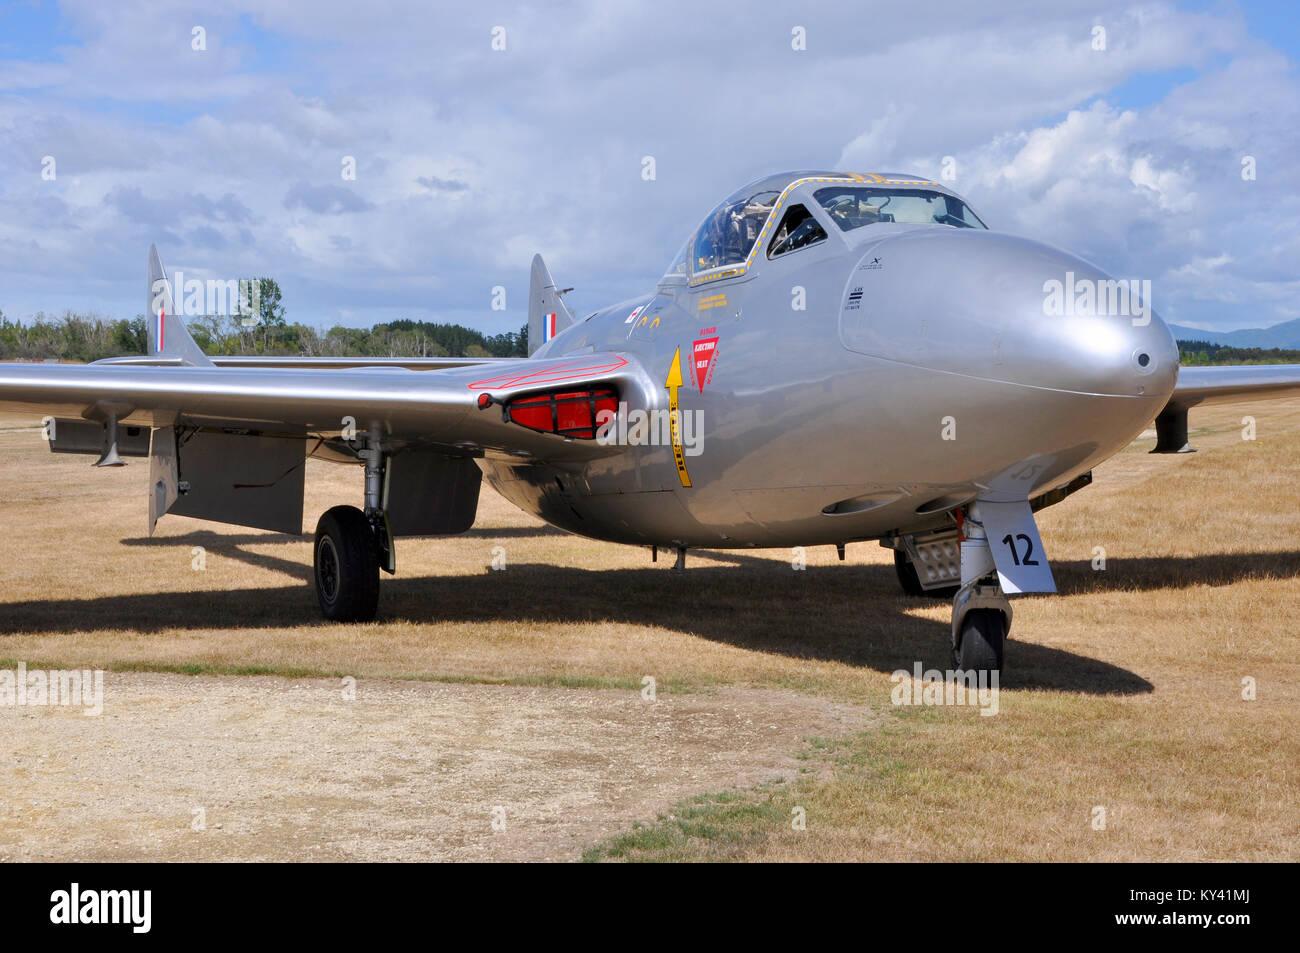 de Havilland Vampire at Wings over Wairarapa airshow Hood Aerodrome Masterton New Zealand. Parked on the grass. - Stock Image